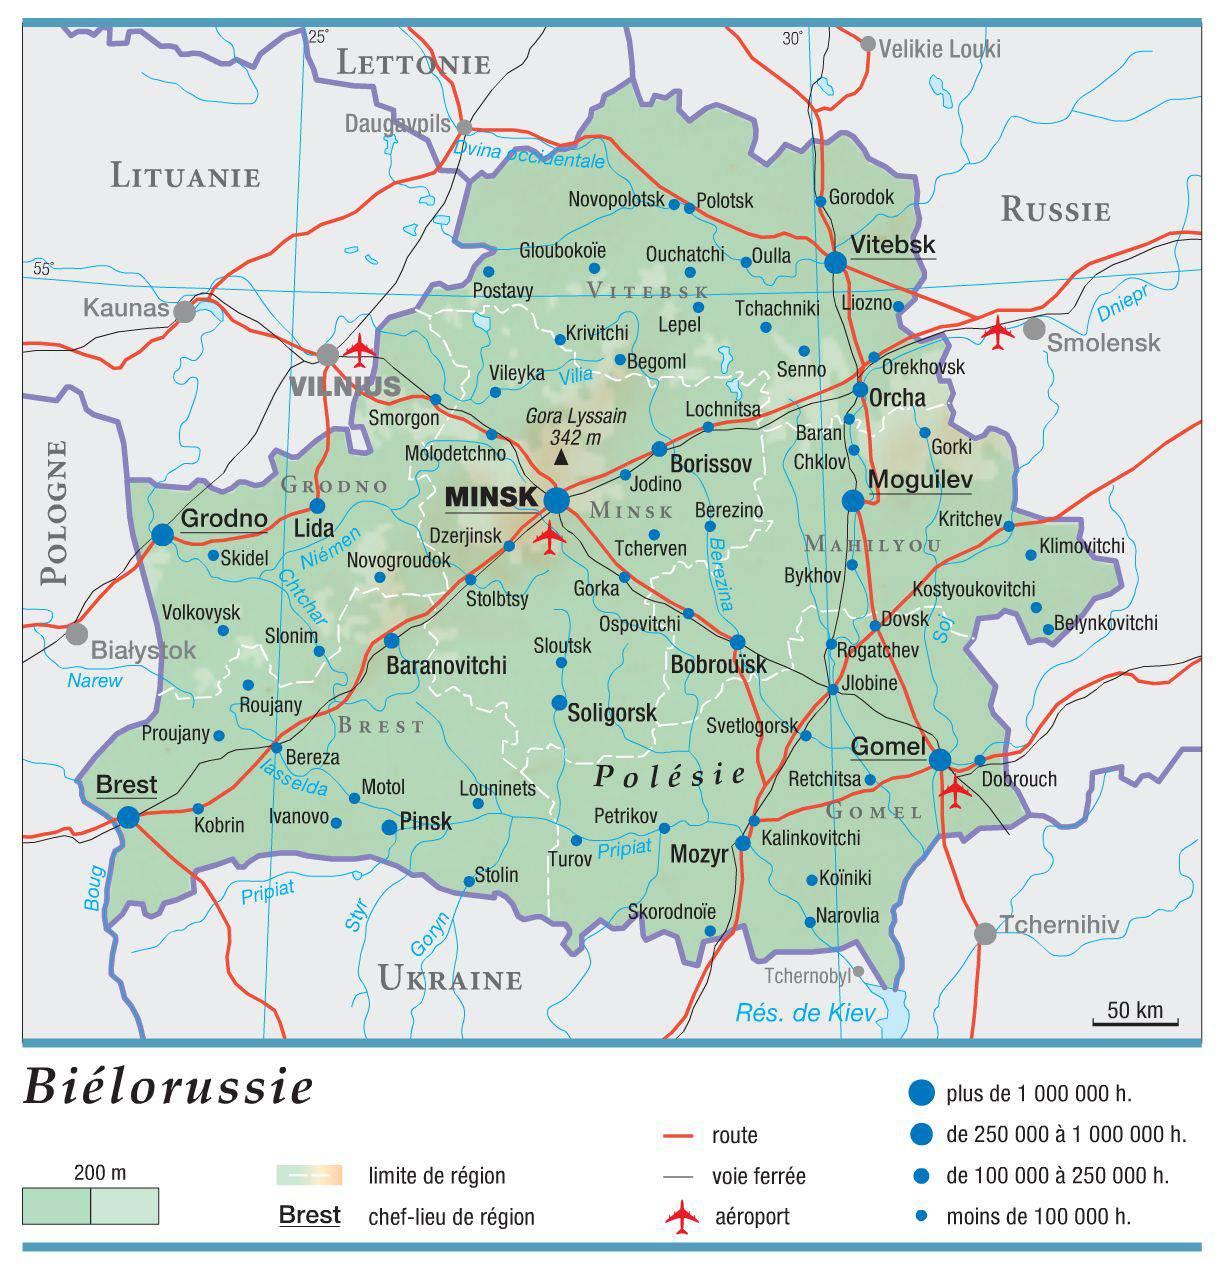 Biélorussie carte